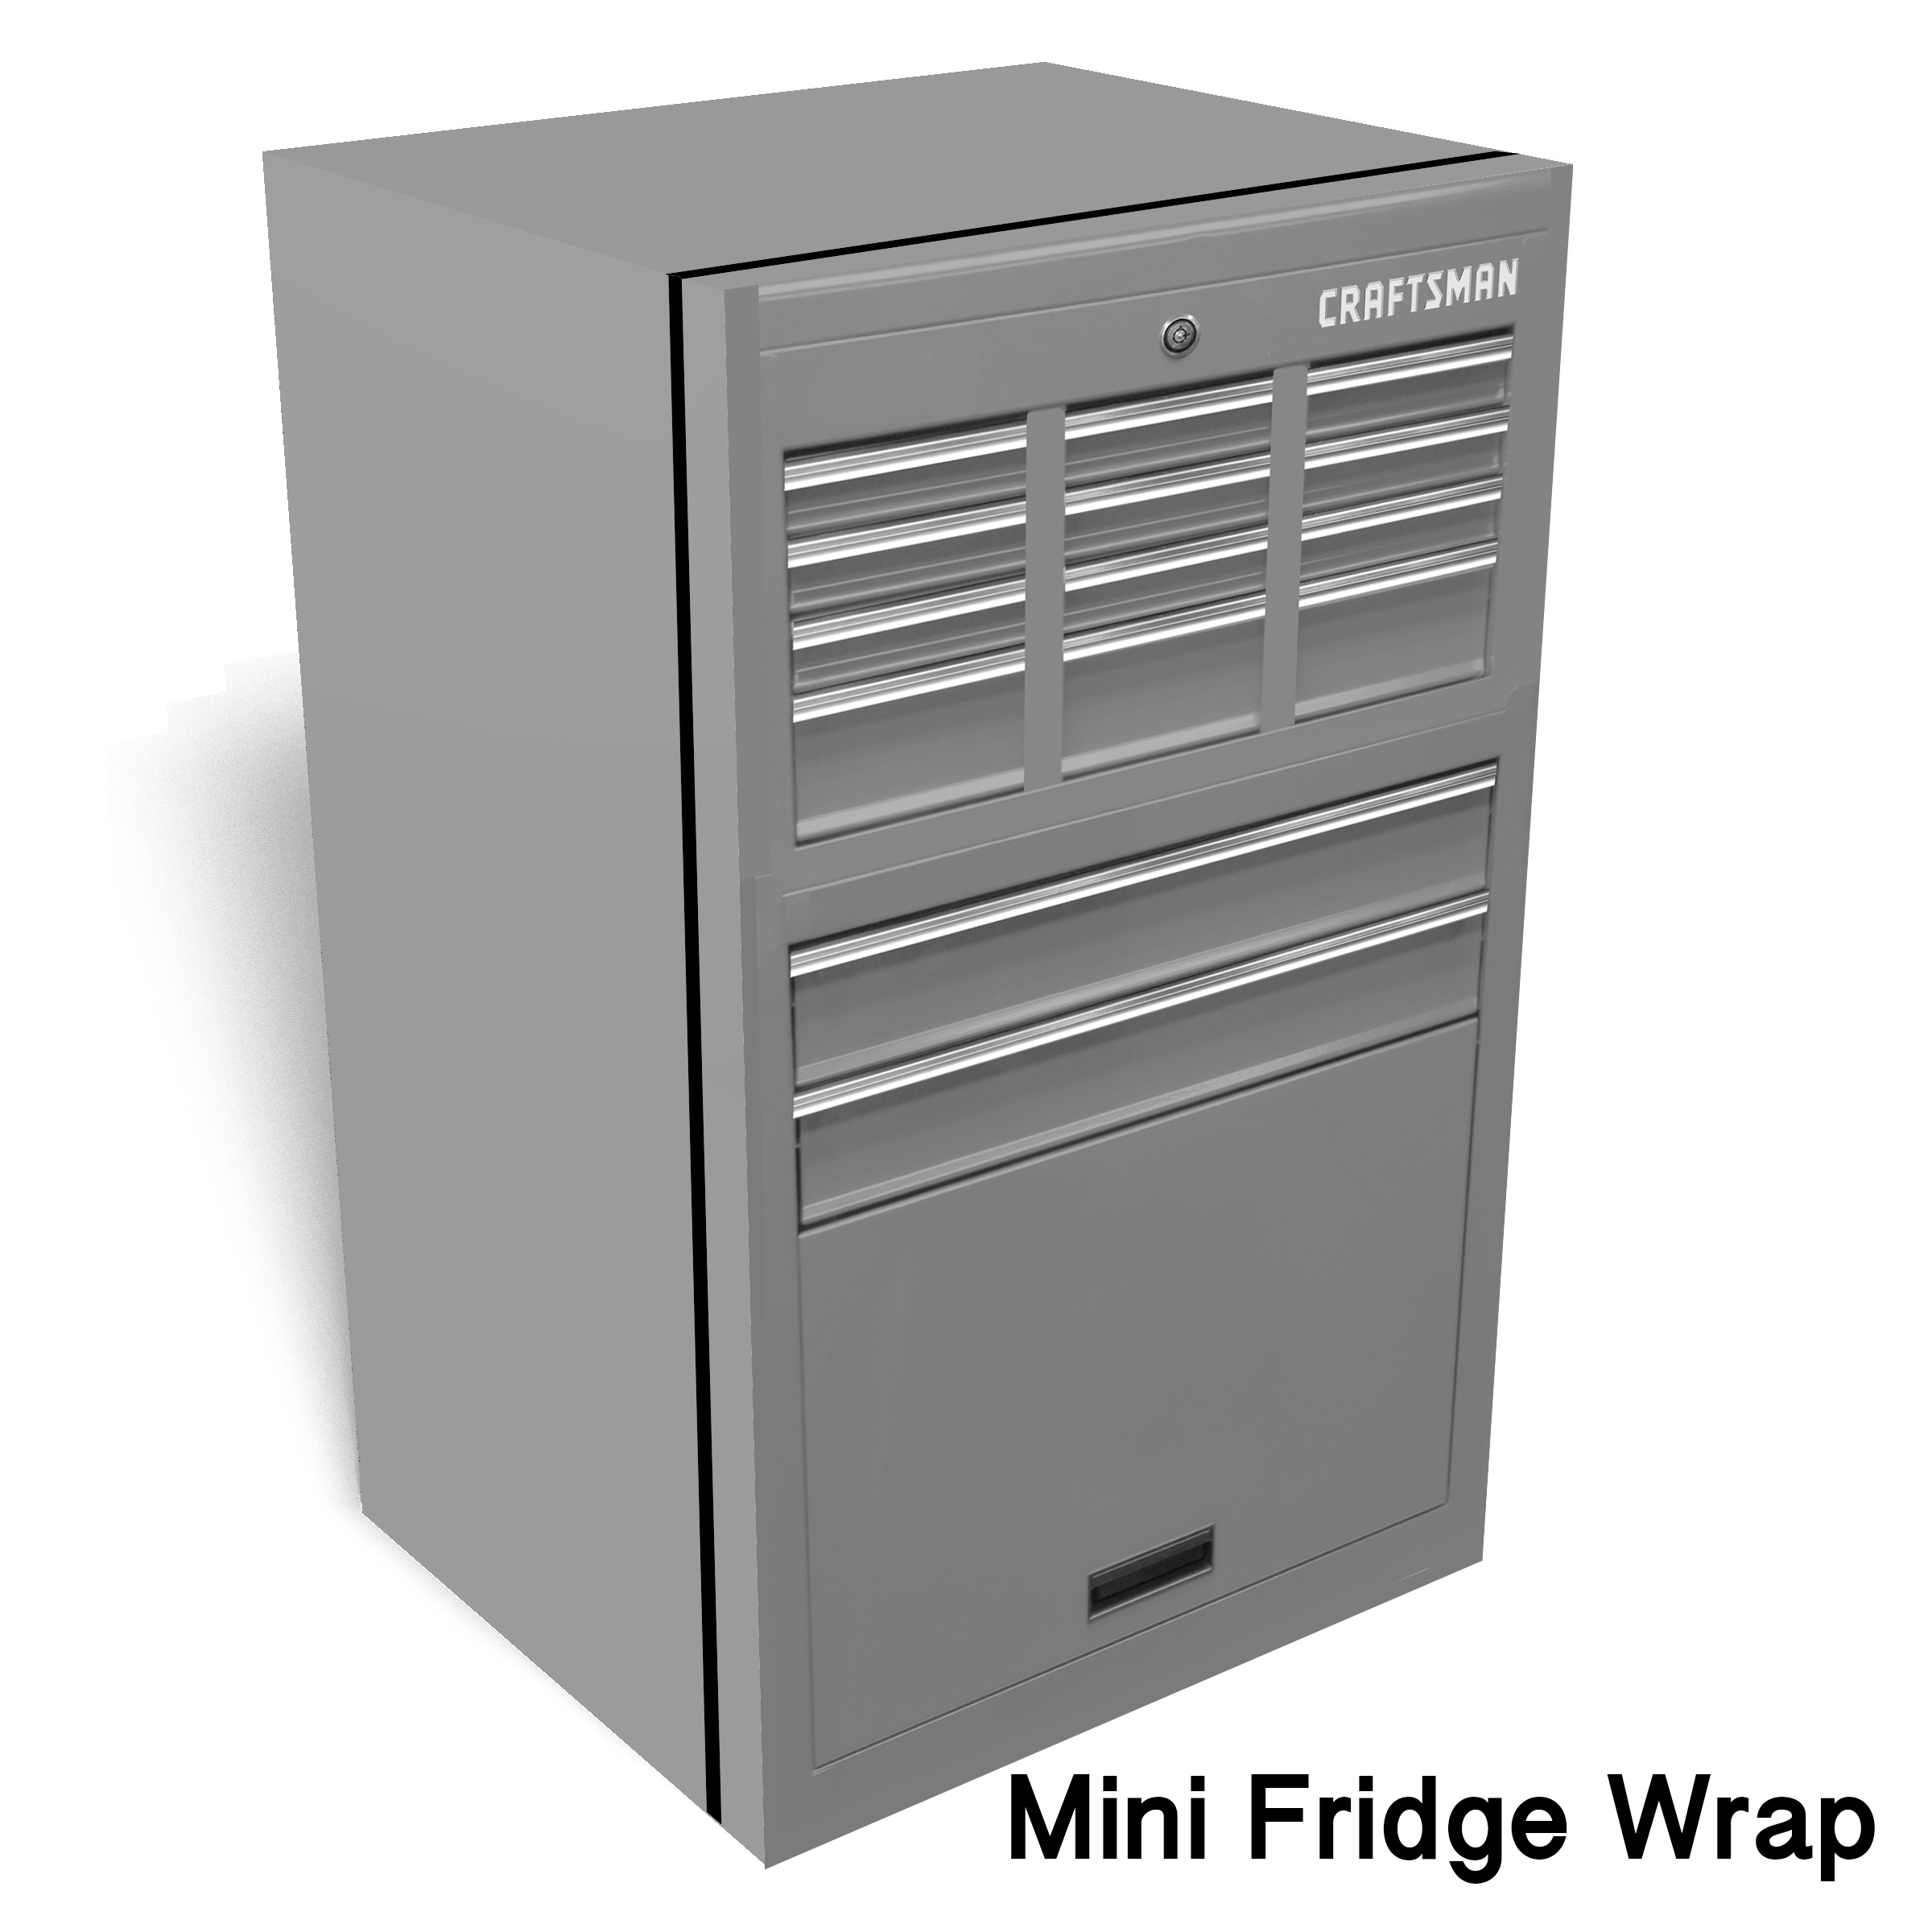 craftsman toolbox mini fridge wrap